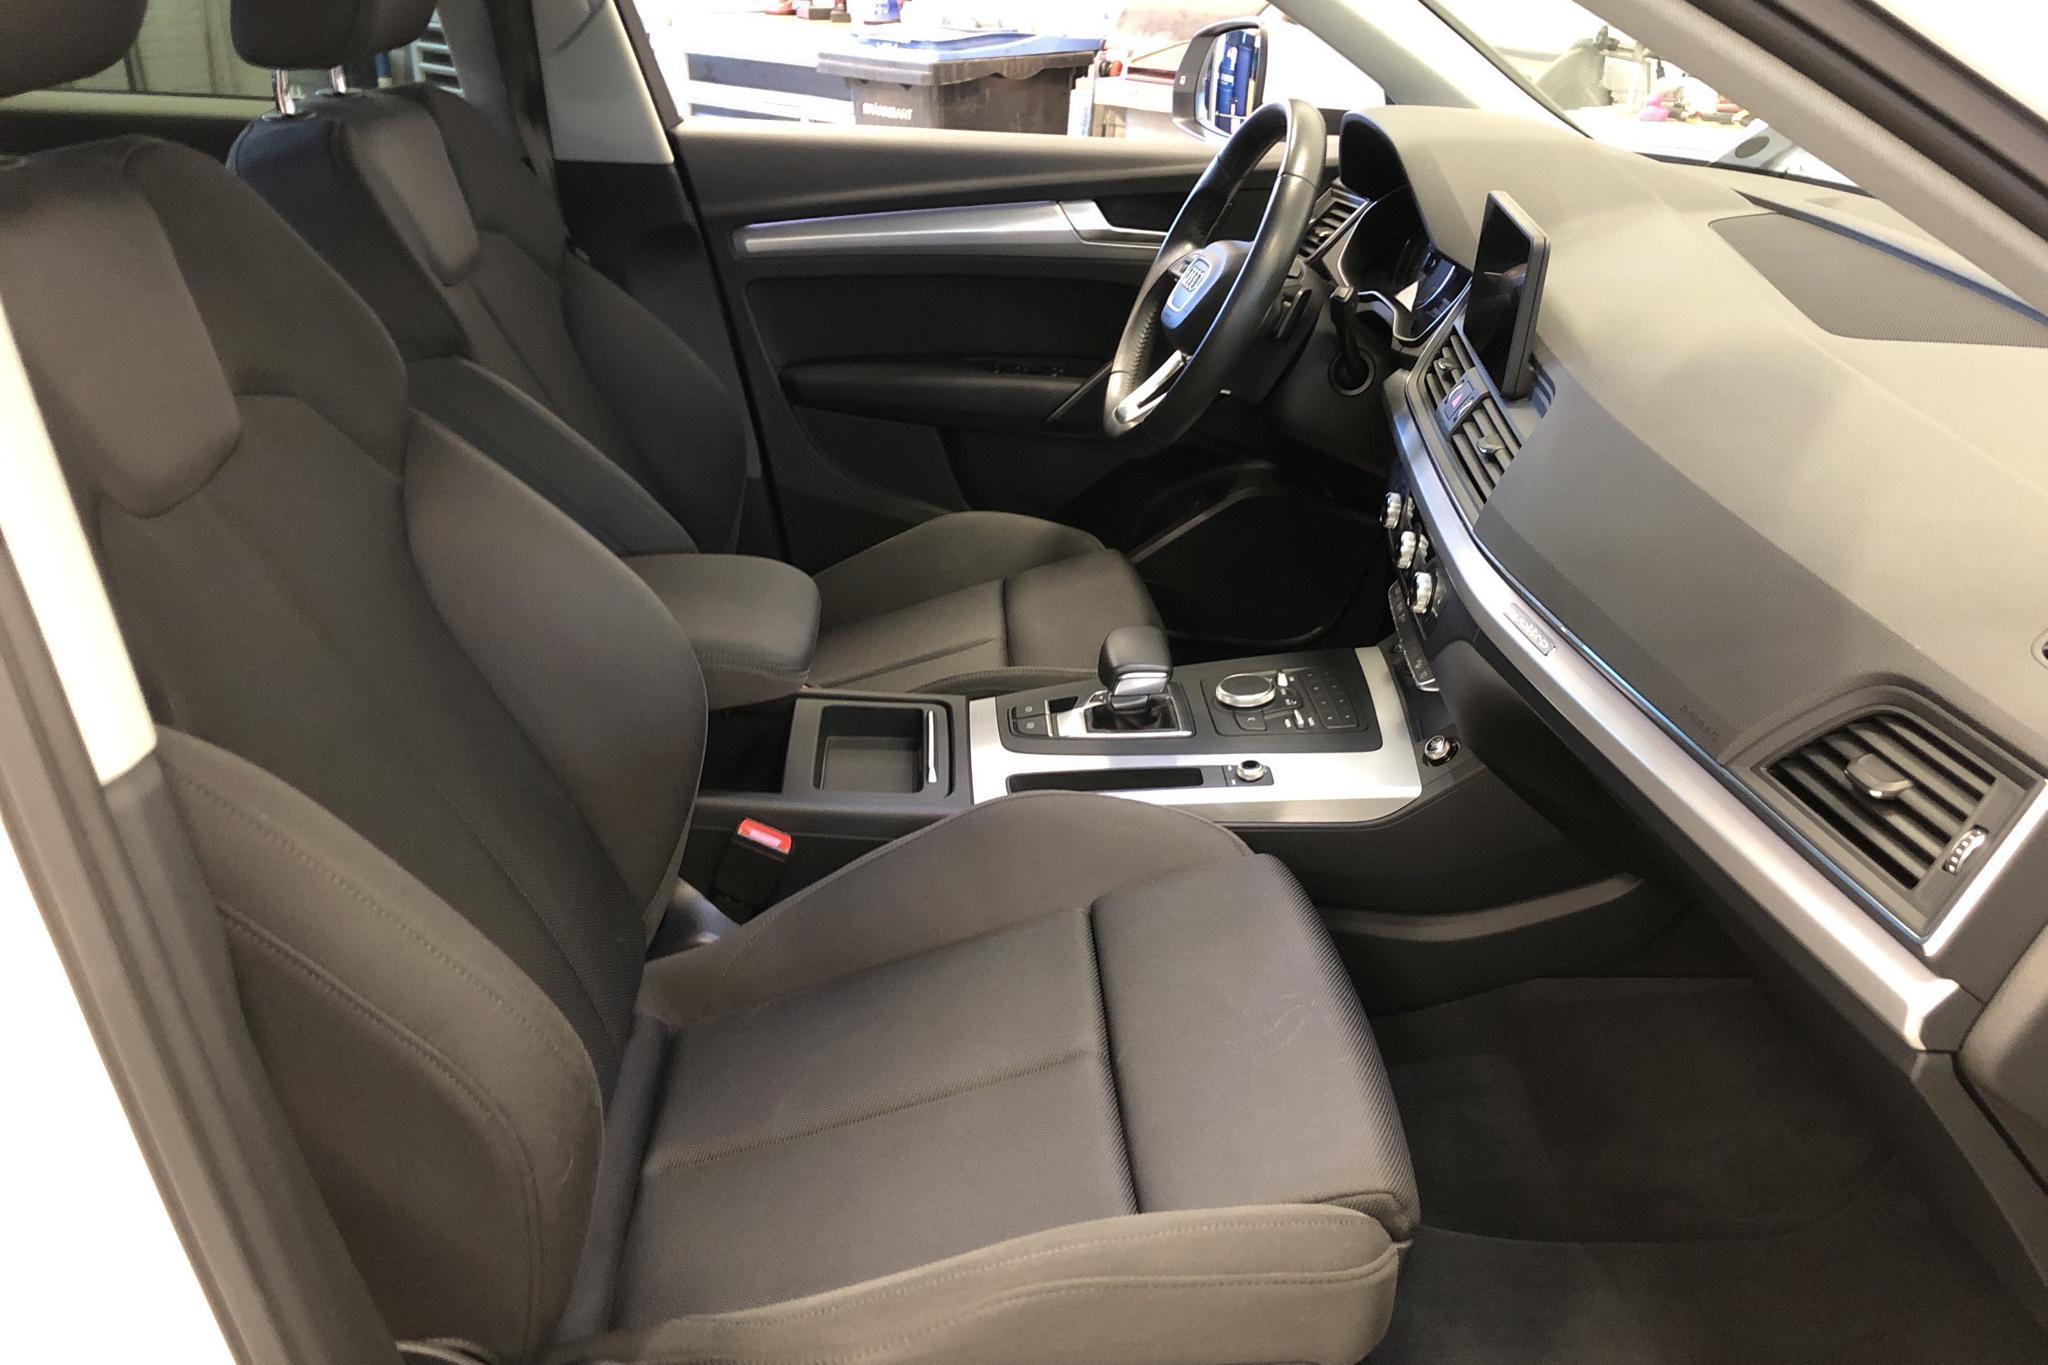 Audi Q5 2.0 TDI quattro (190hk) - 102 240 km - Automatic - white - 2018